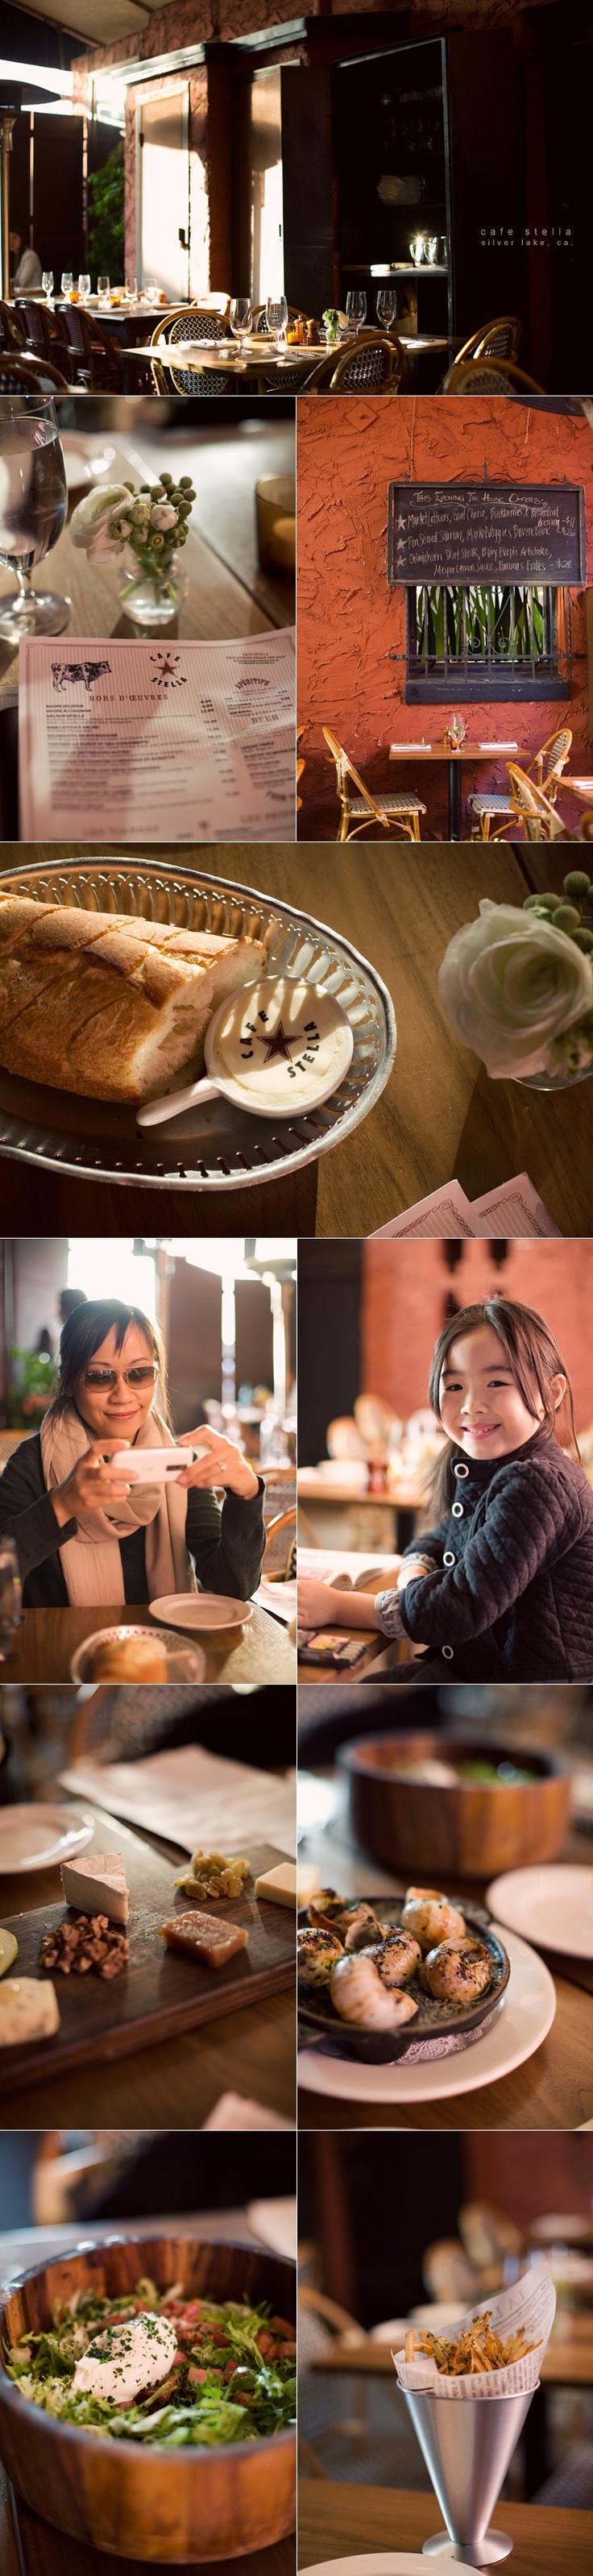 Dinner alfresco at Cafe Stella.     CALI TRIPPING // cafe stella, los angeles // photography bonnie tsang #splendidsummer